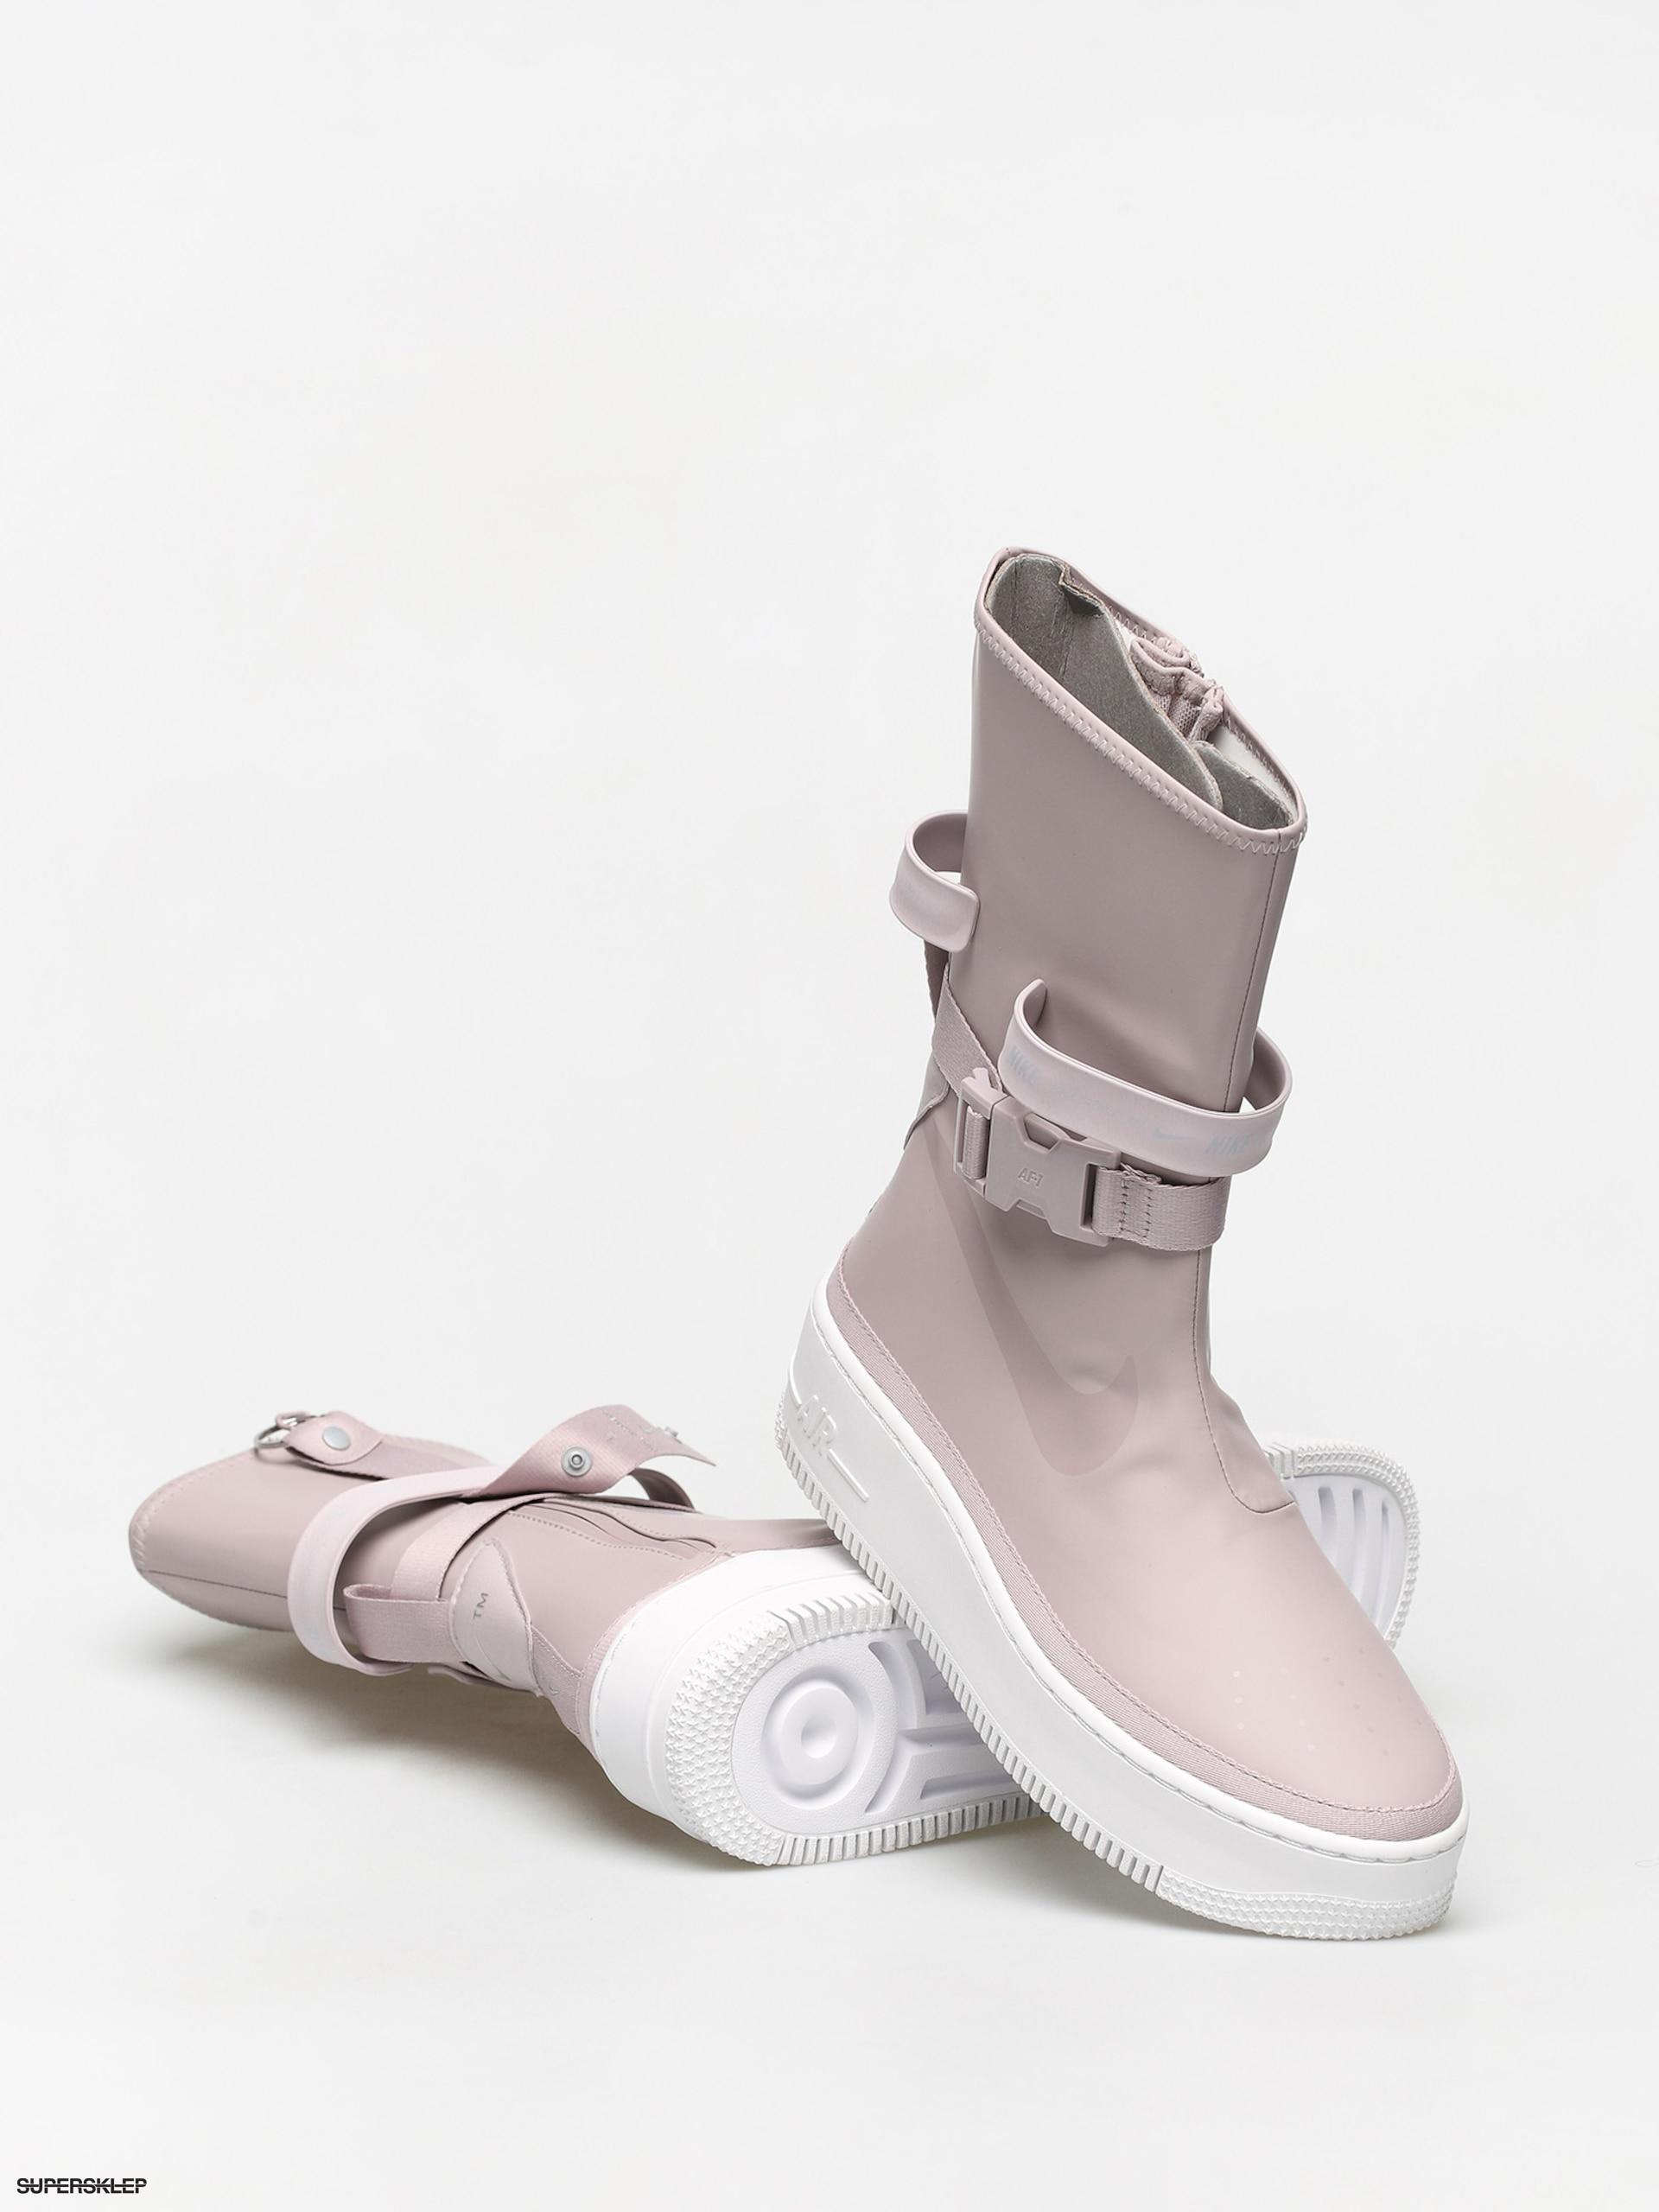 Nike Buty damskie Air Force 1 Sage High Fiolet AQ2771 500